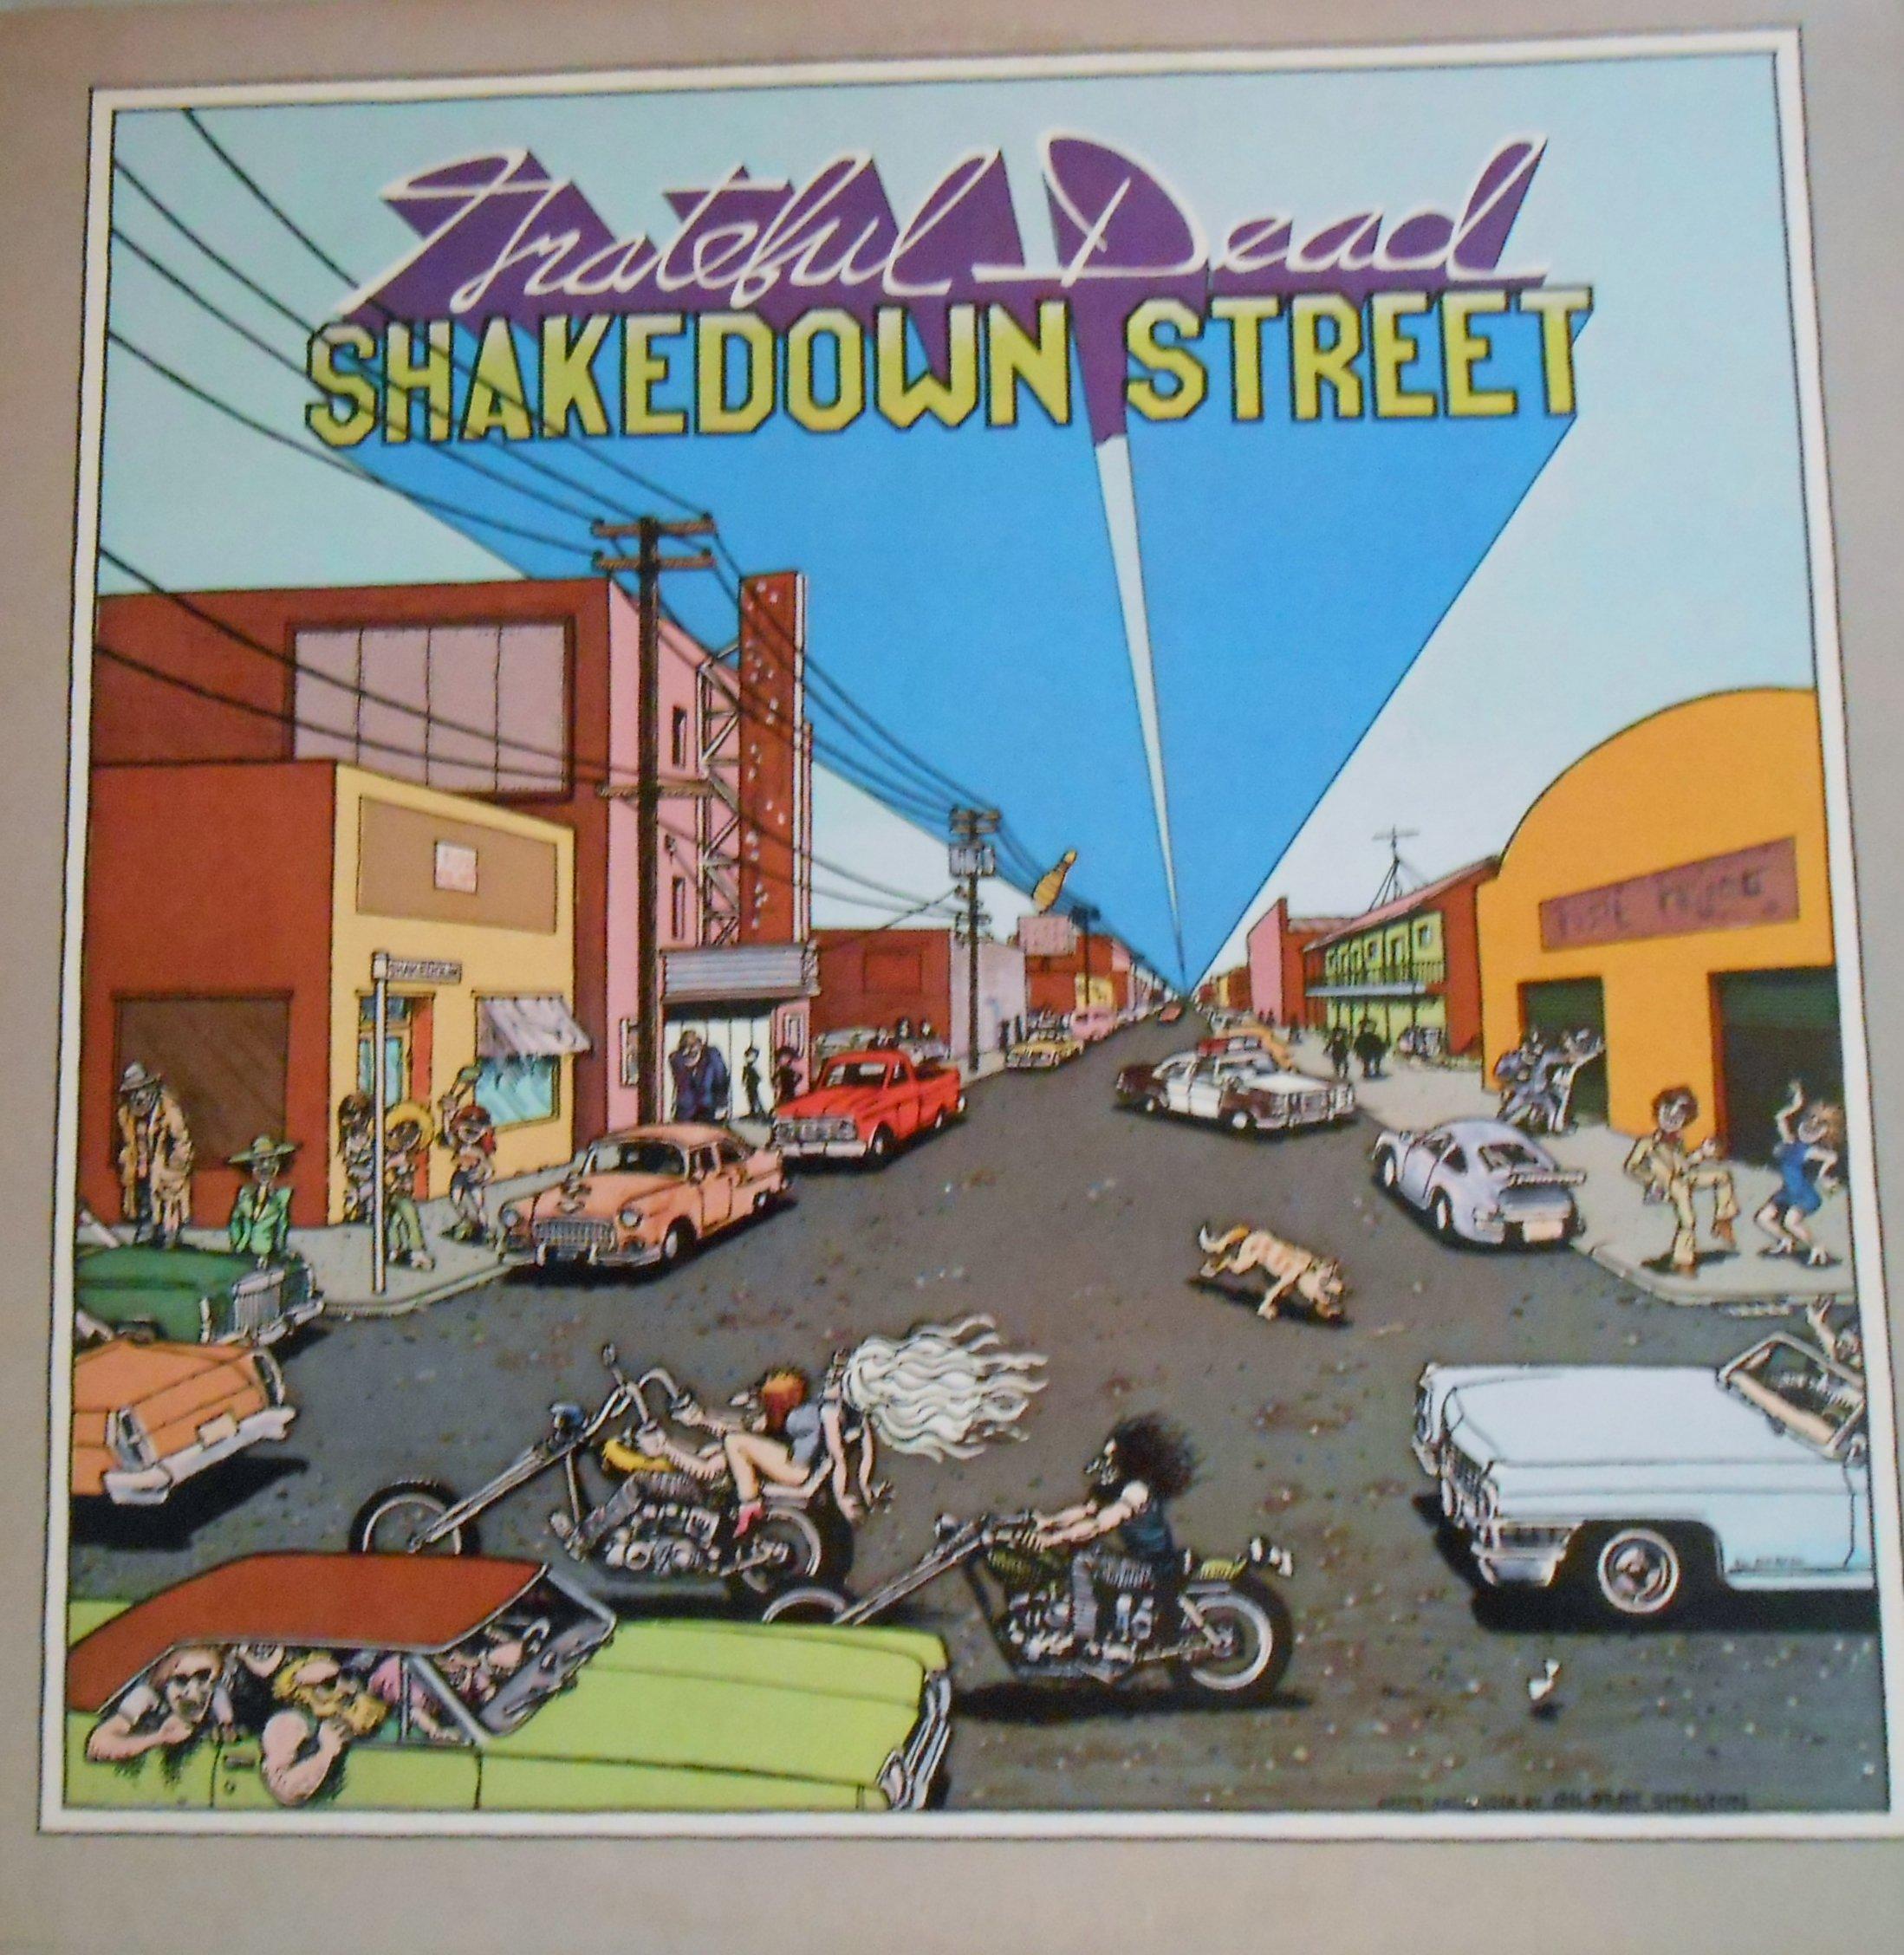 Shakedown Street by Arista